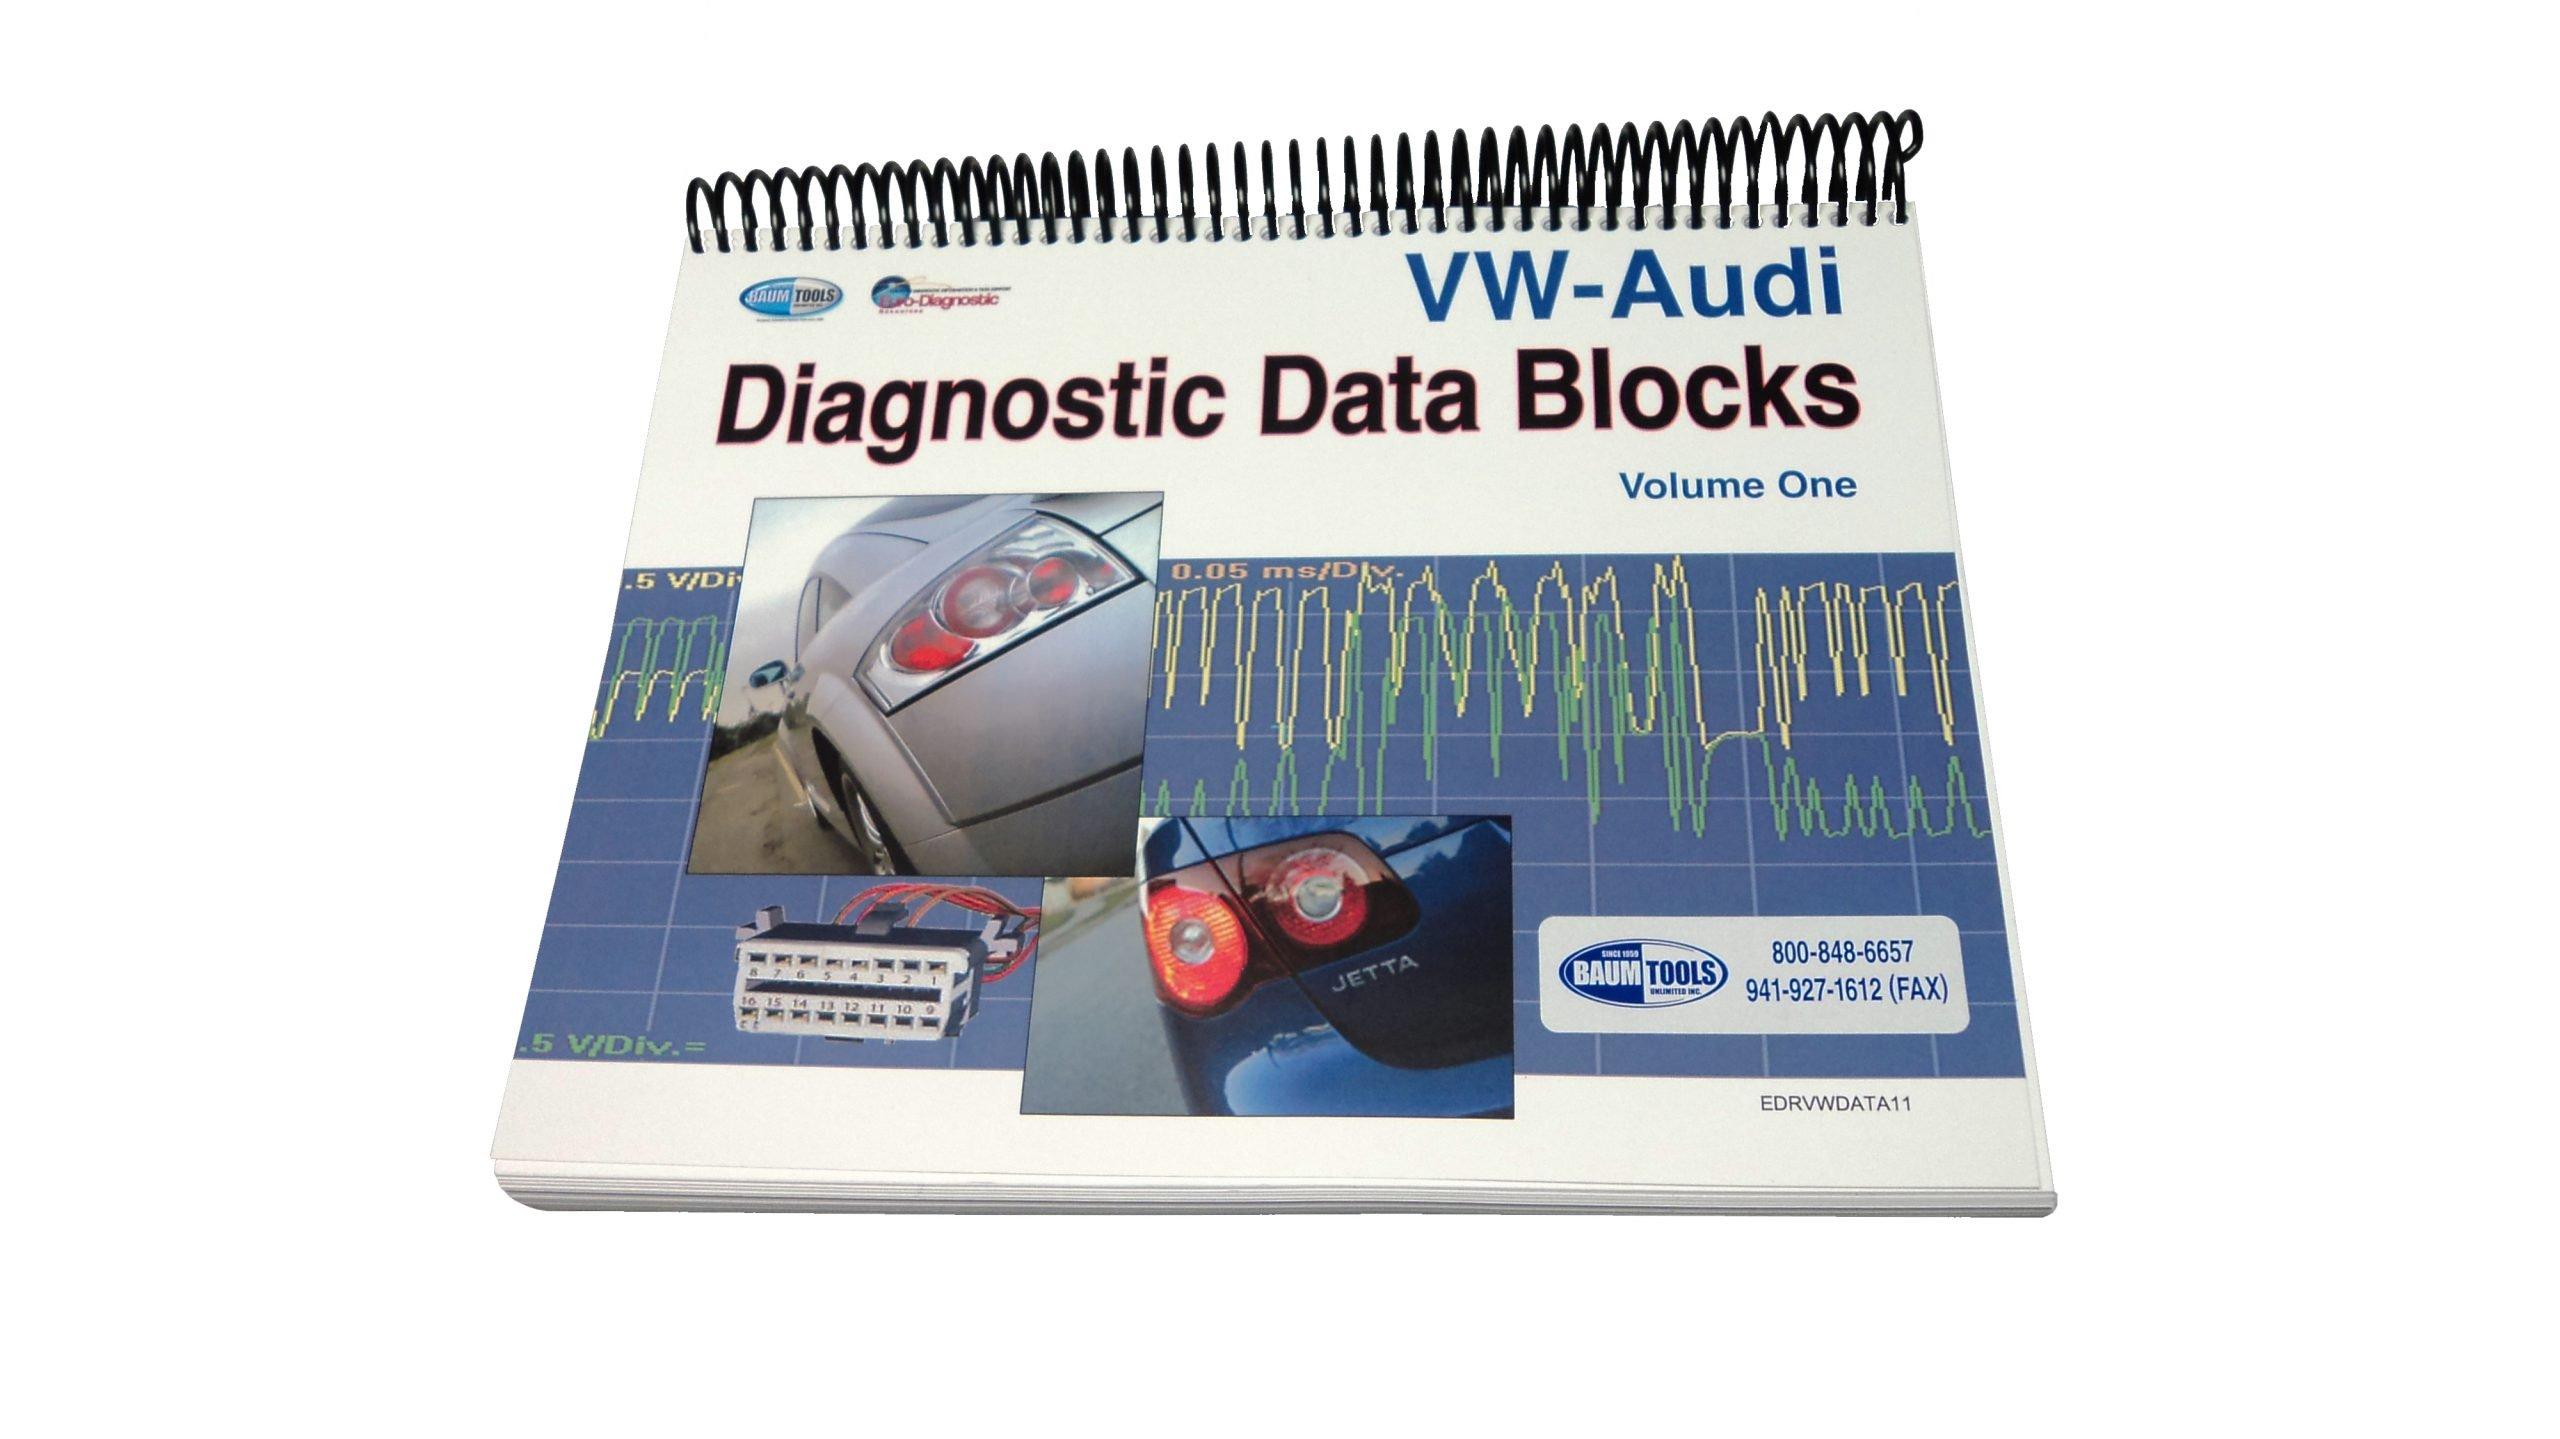 VW-Audi Diagnostic Data Blocks, Volume One